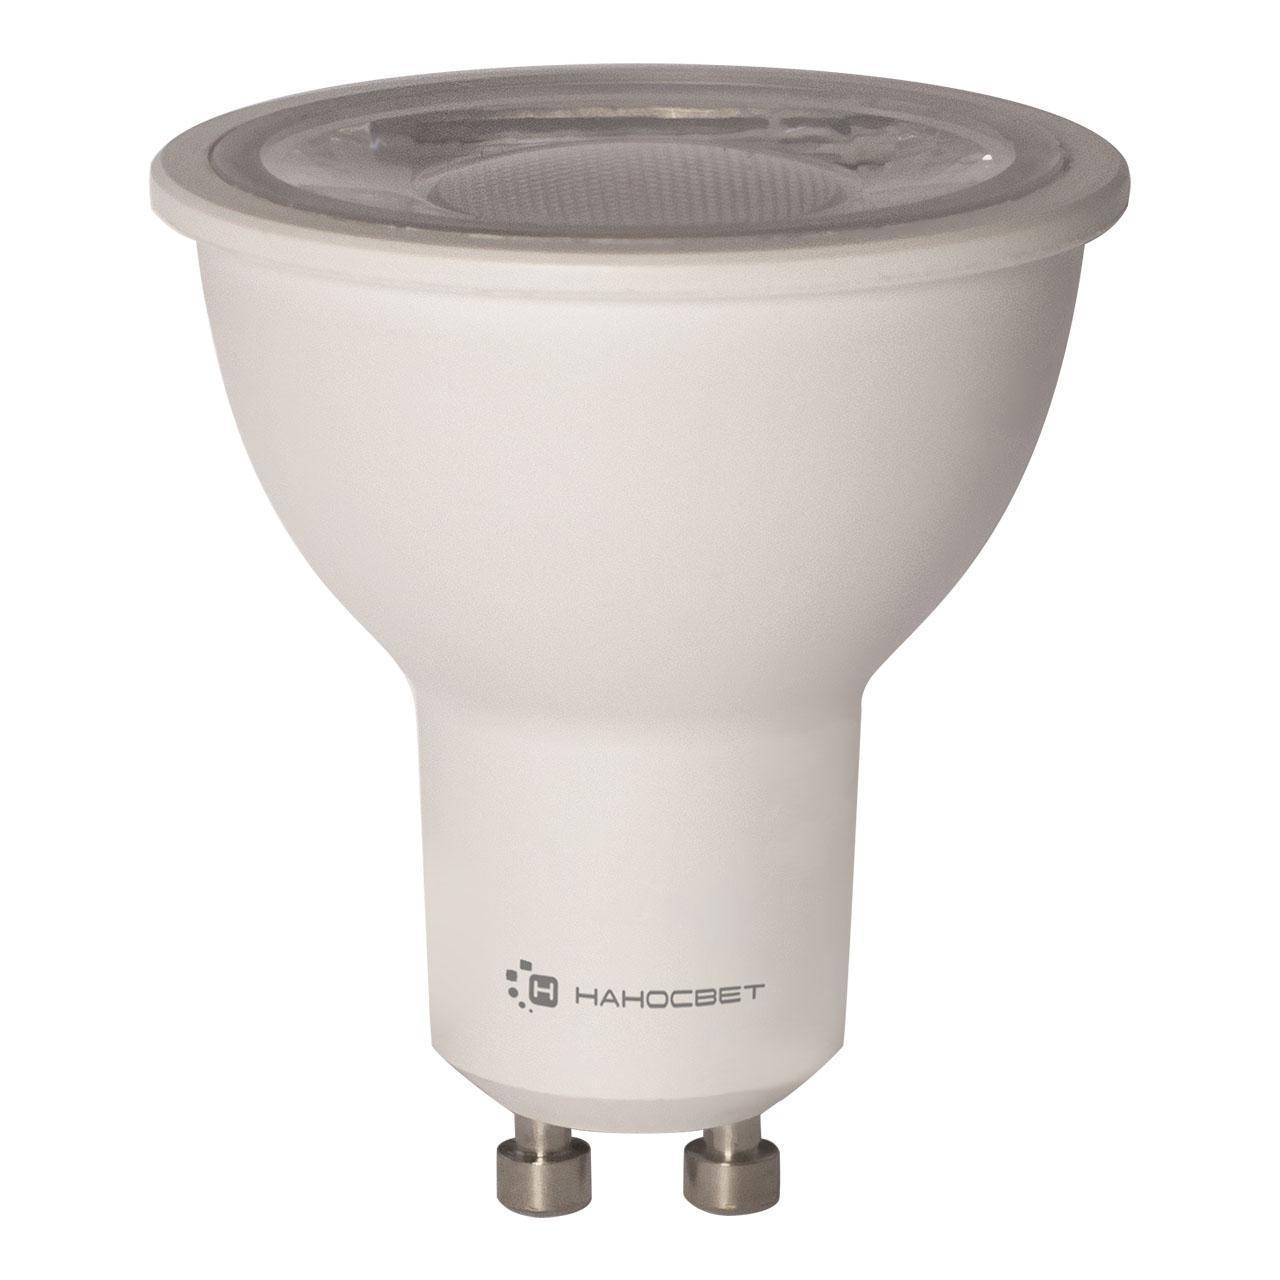 Лампа светодиодная GU10 8,5W 2700K прозрачная LH-MR16-8.5/GU10/827/38D L286 лента светодиодная полусфера наносвет l286 gu10 8 5w 2700k lh mr16 8 5 gu10 827 38d